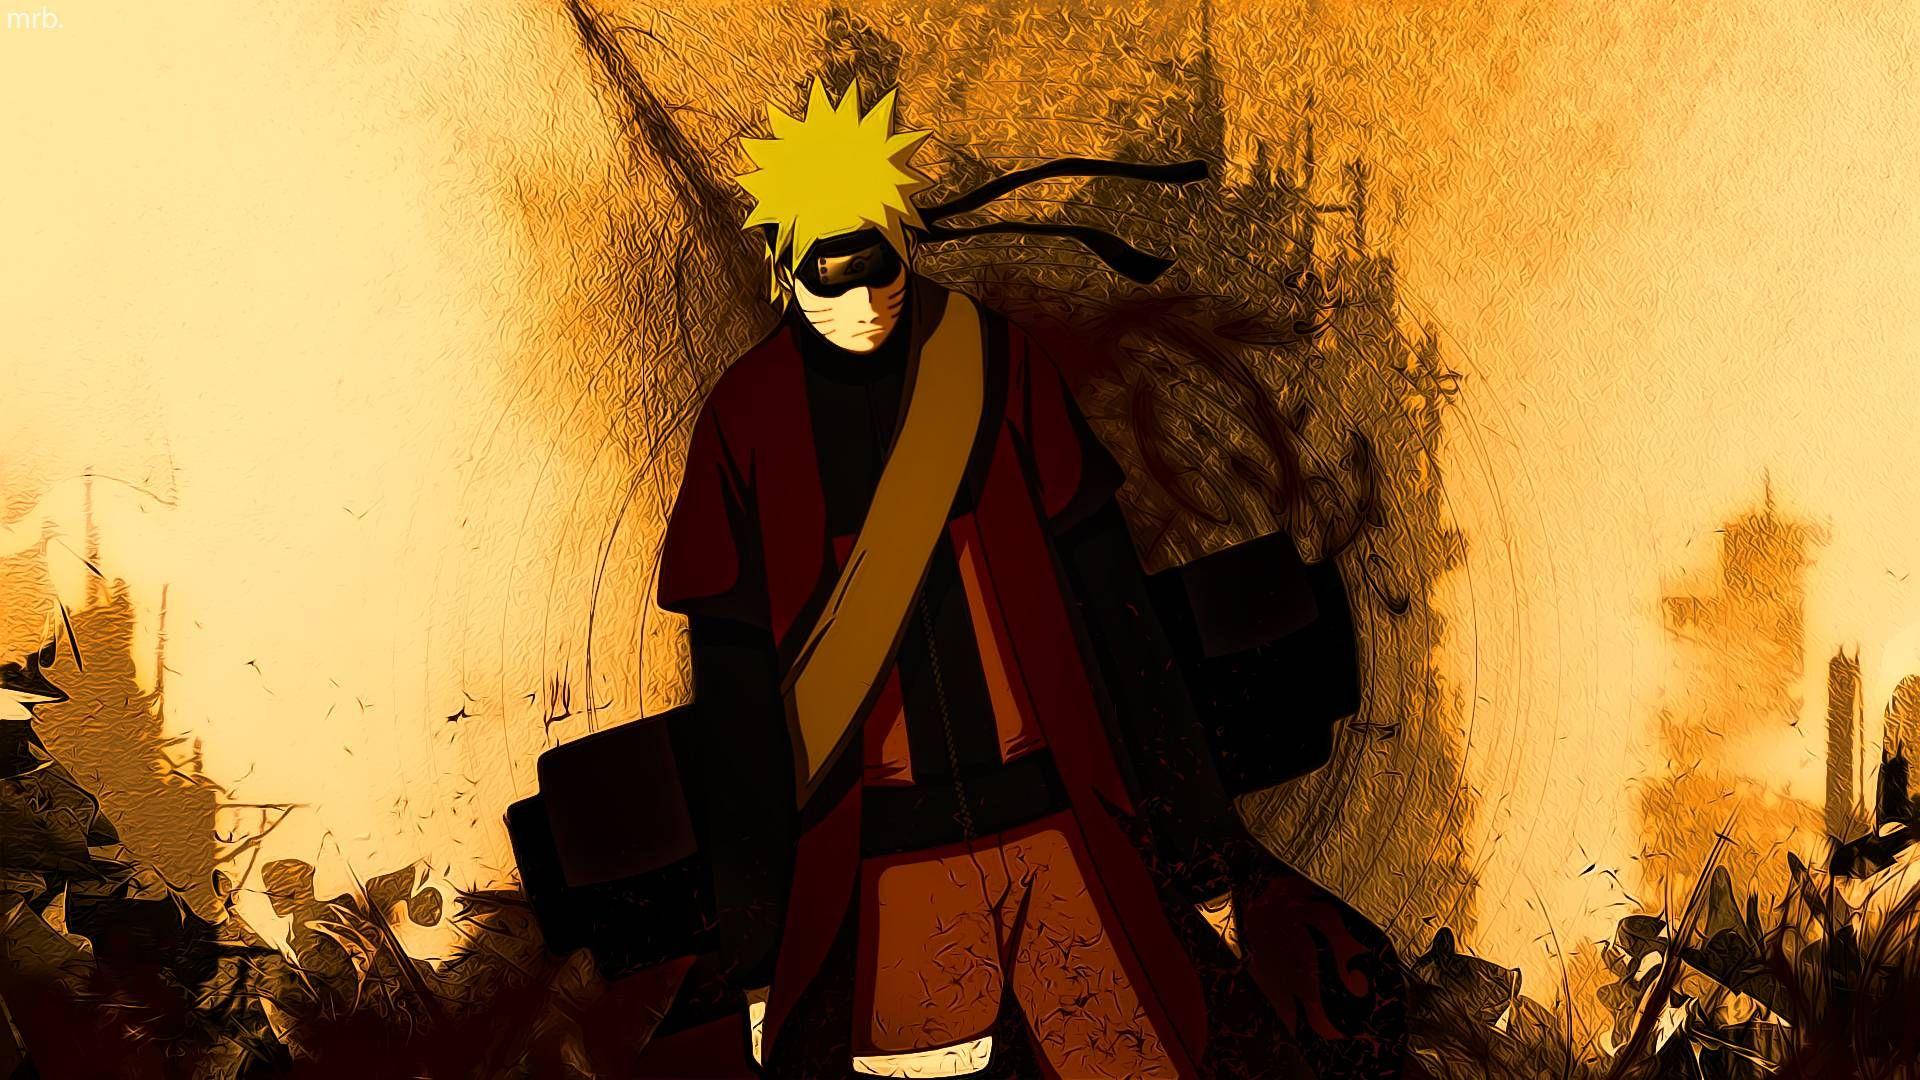 Naruto Hd Wallpaper 1920 1080 Naruto Wallpaper Naruto Phone Wallpaper Wallpaper Naruto Shippuden